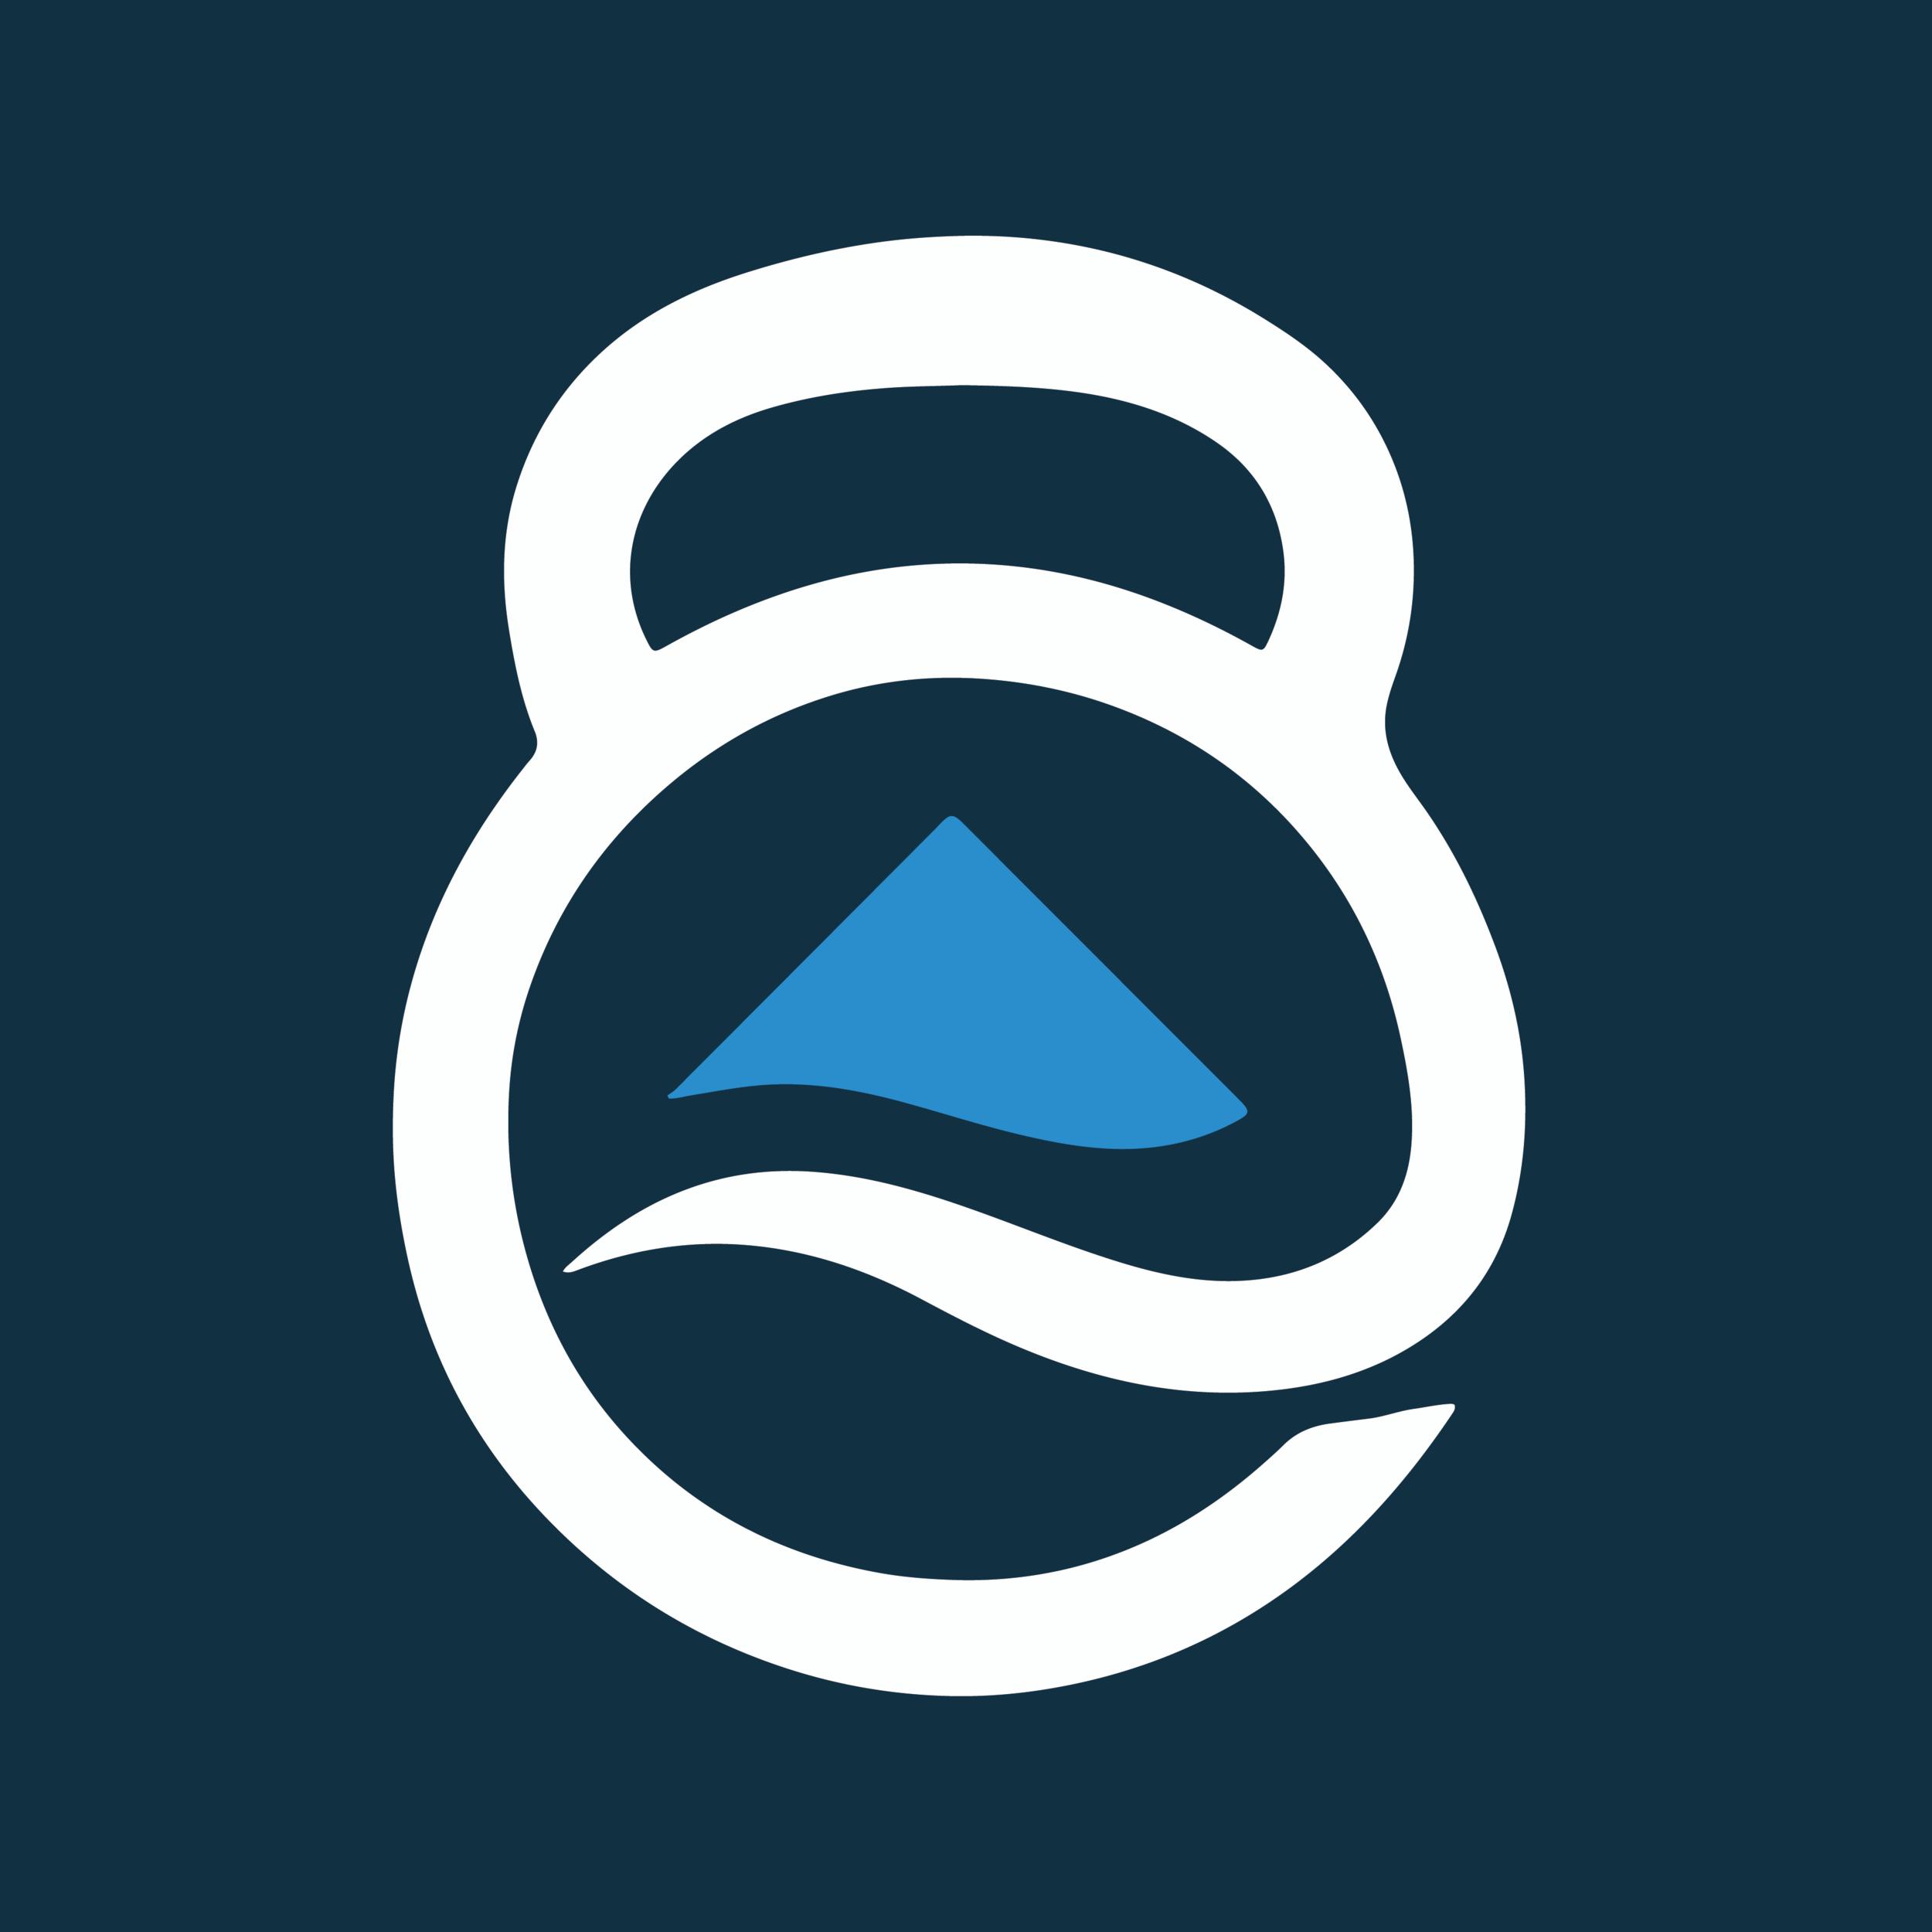 CrossFit Unboxed - Branding IdentityDigital DesignEnvironmental Graphics